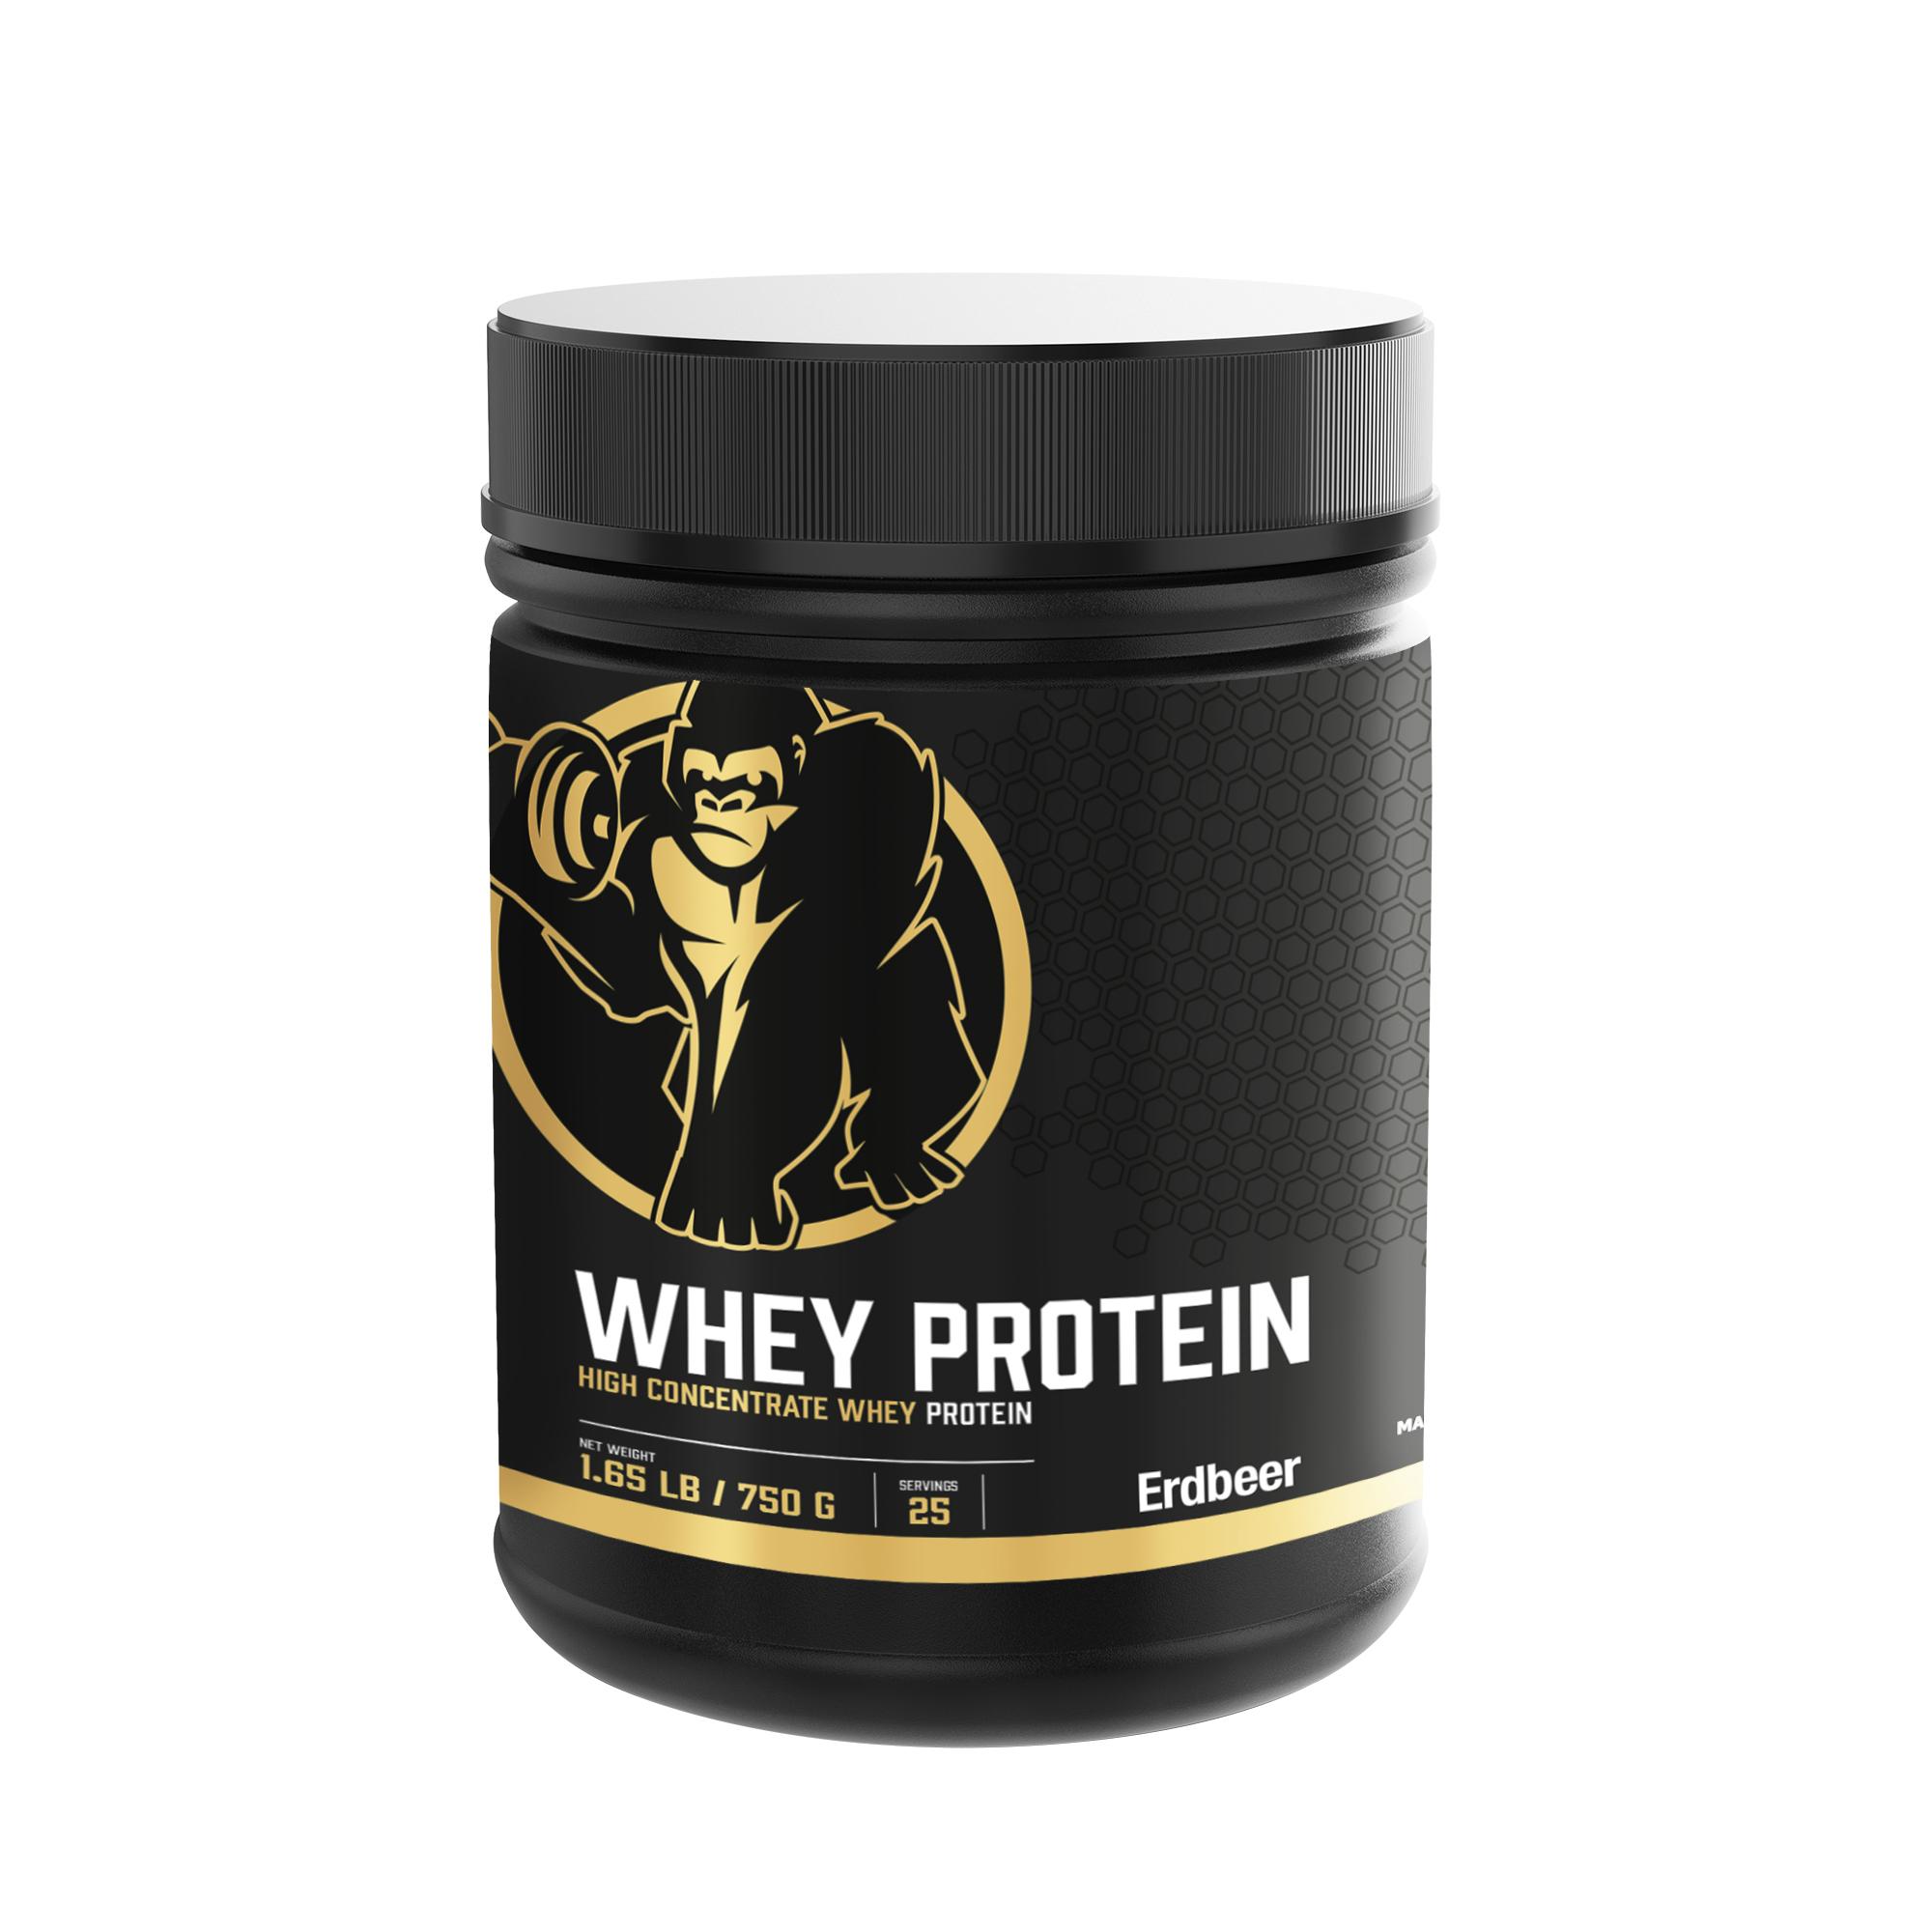 Whey Protein Erdbeer 750 g